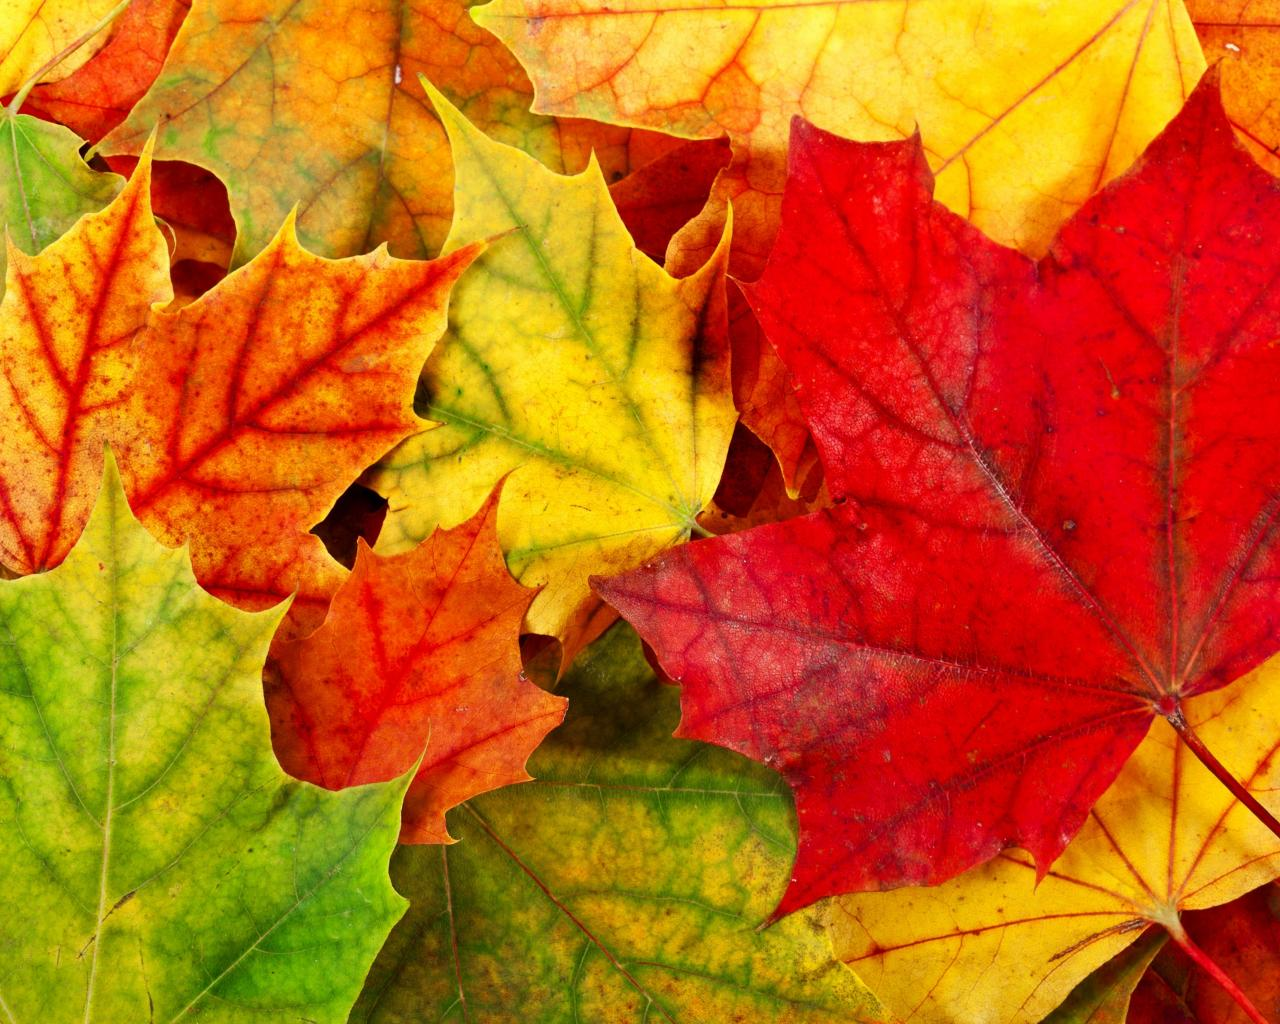 Wallpaper Tags: lovely autumn colors fall leaves autumn splendor beautiful photography leaf pretty autumn autumn leaves beauty